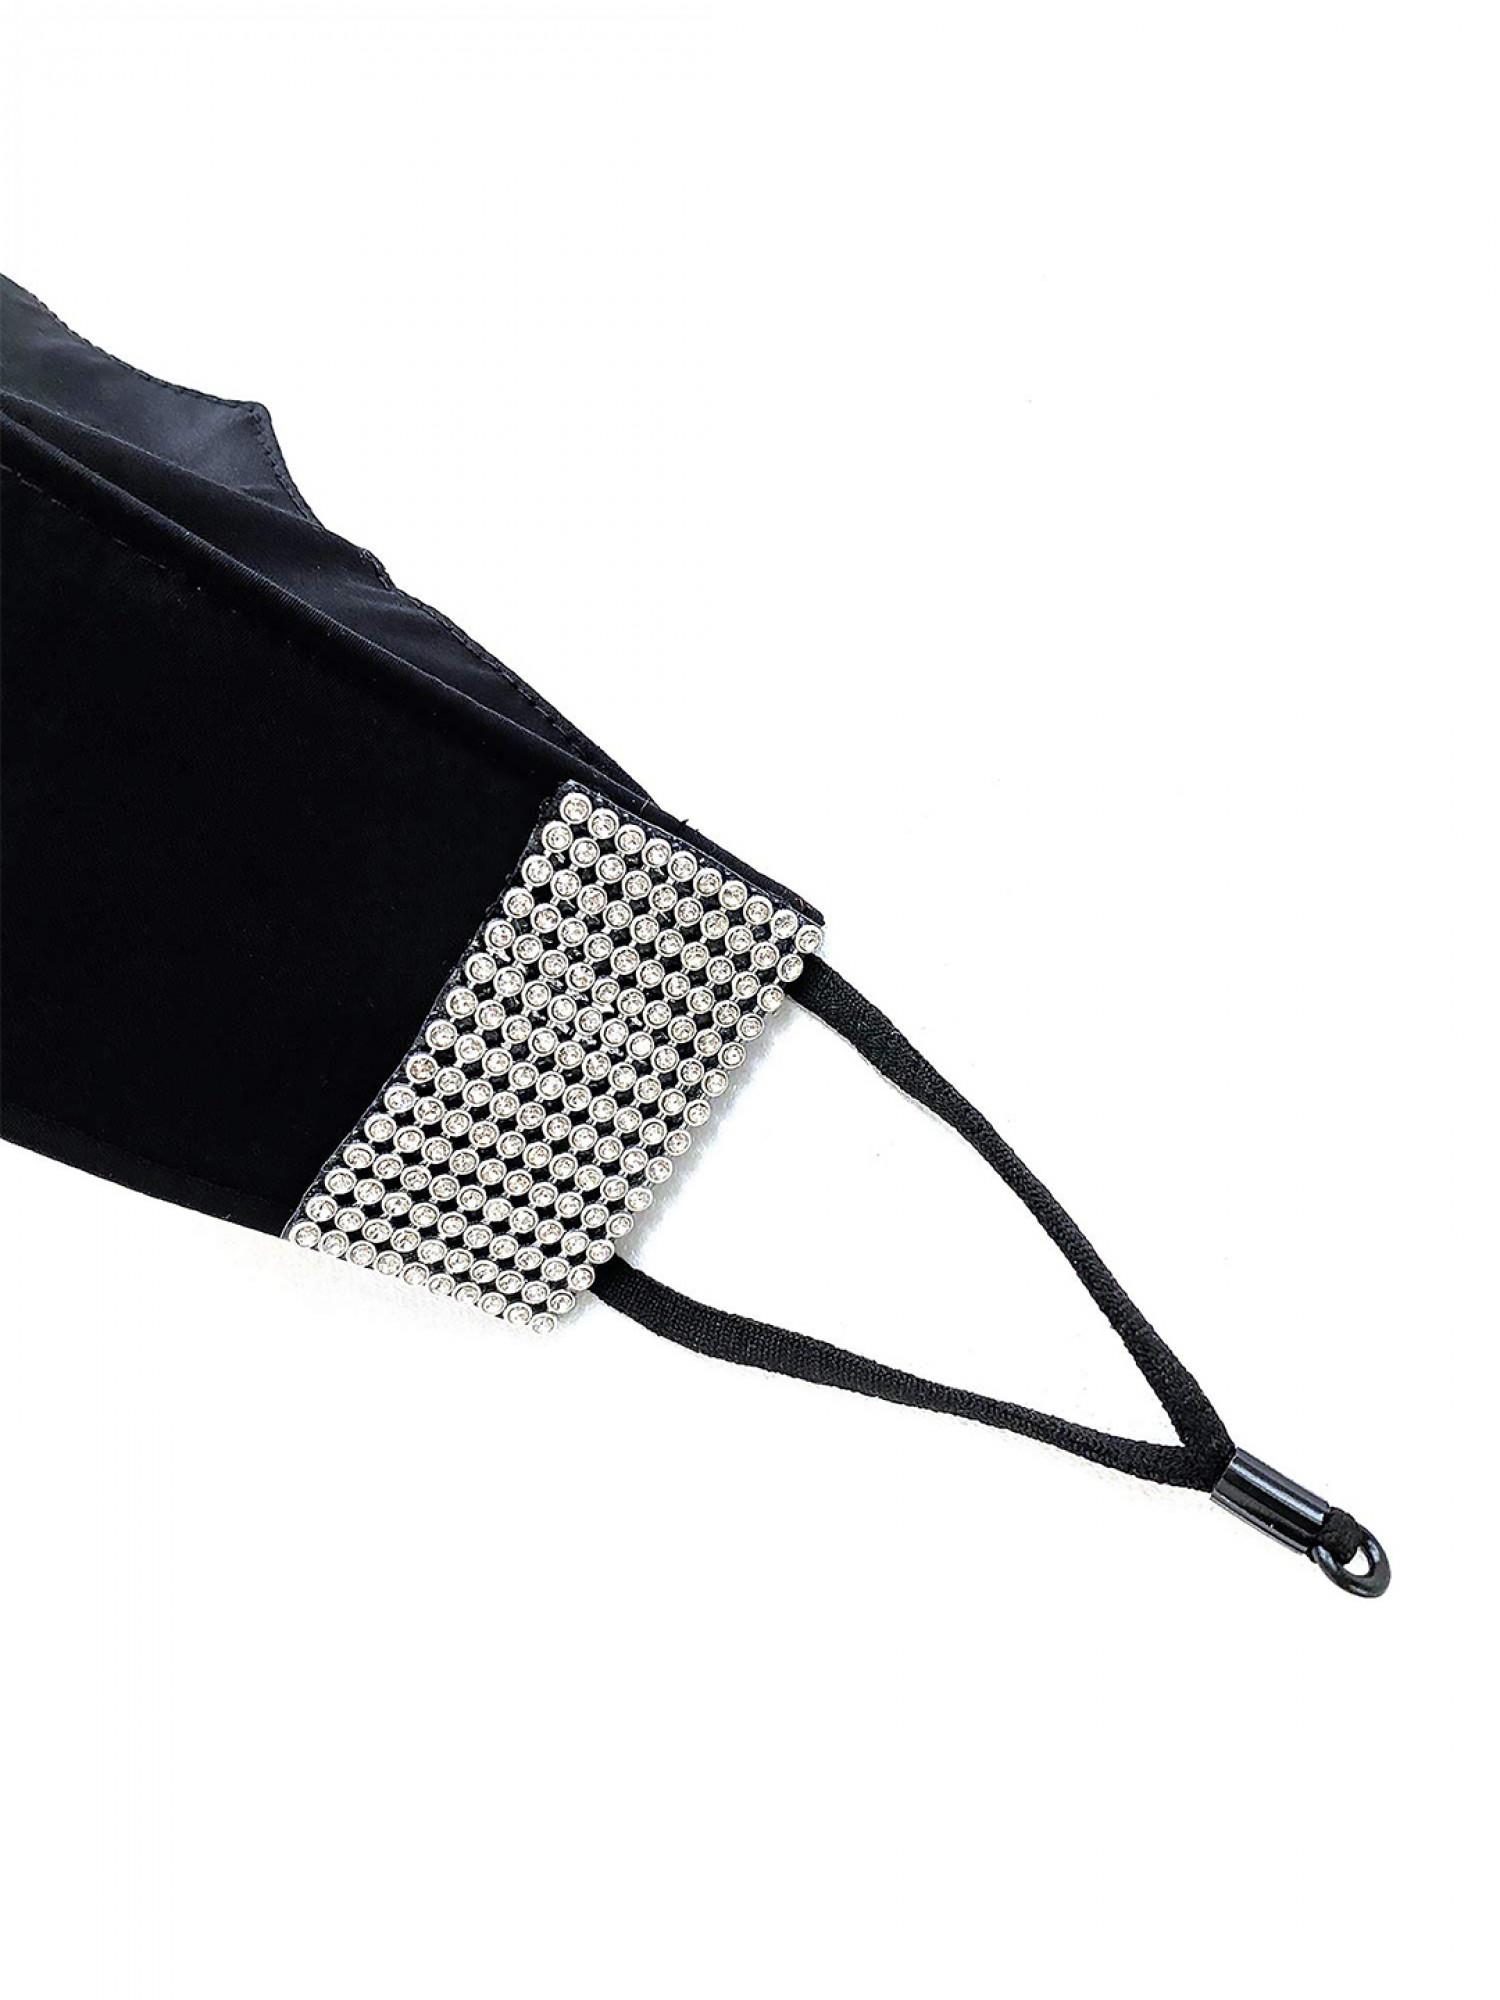 3D Bling Diamond Work Mask - 7 Layer Mask 99% Safe